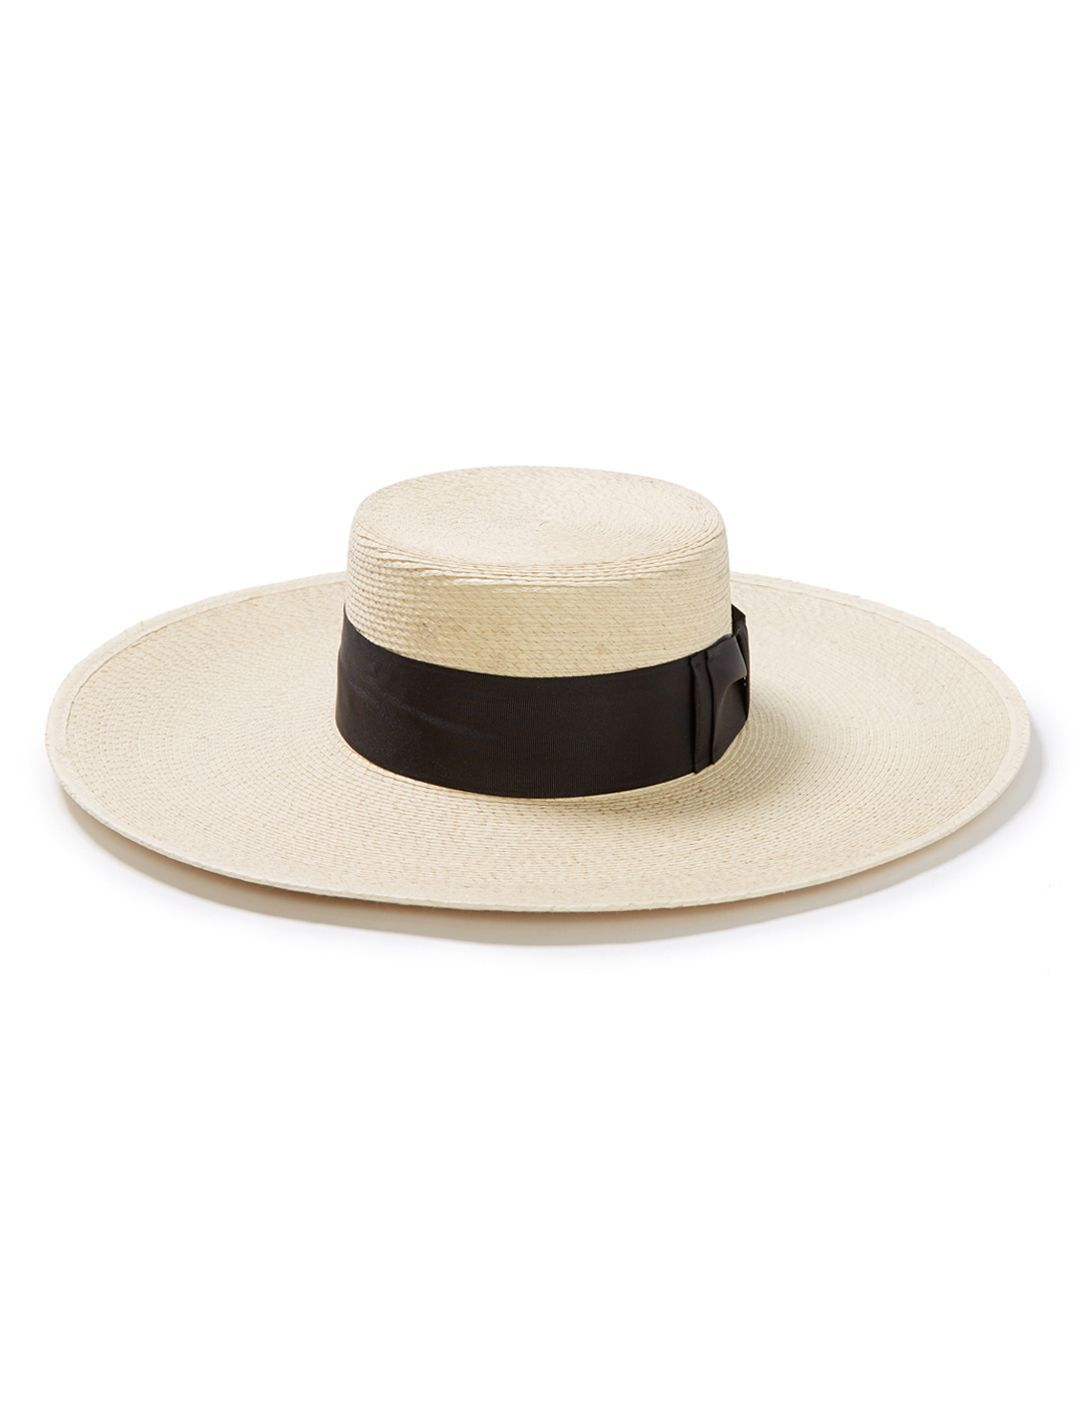 d118d1d45f455 Stetson Women s Sunny Straw Boater Hat TSSUNY0050. Details